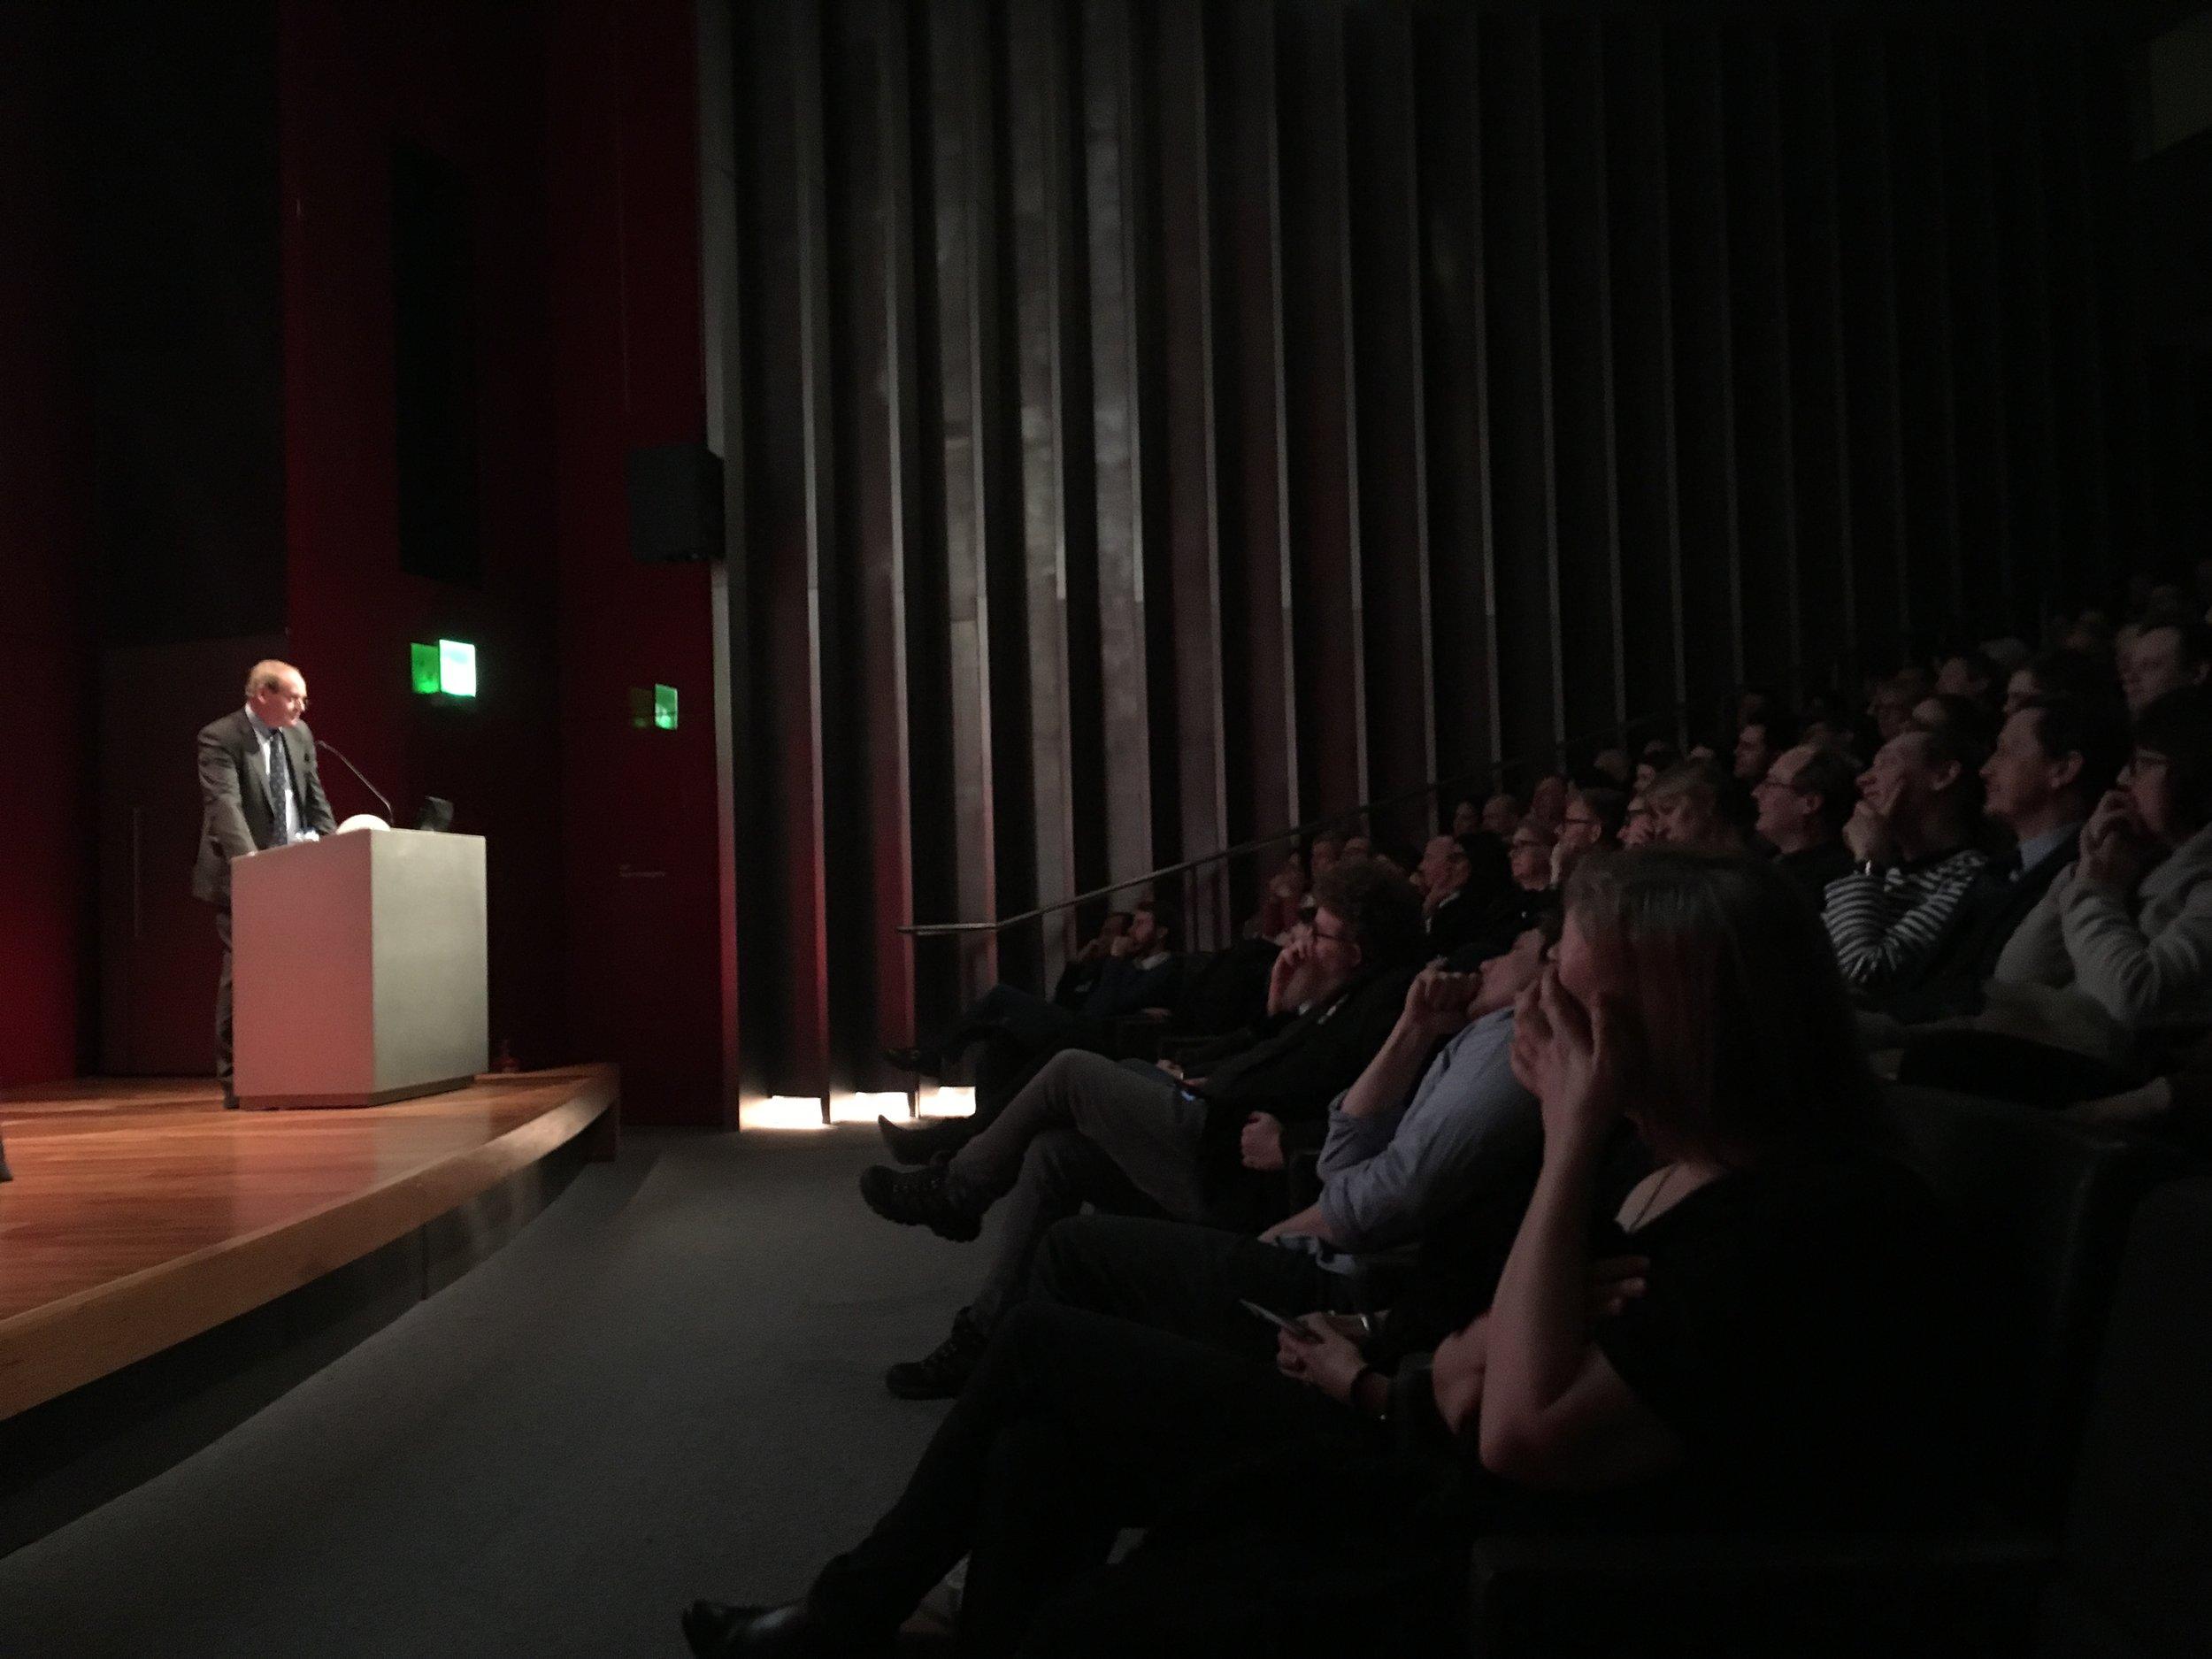 John Lloyd delivering his talk at the British Museum